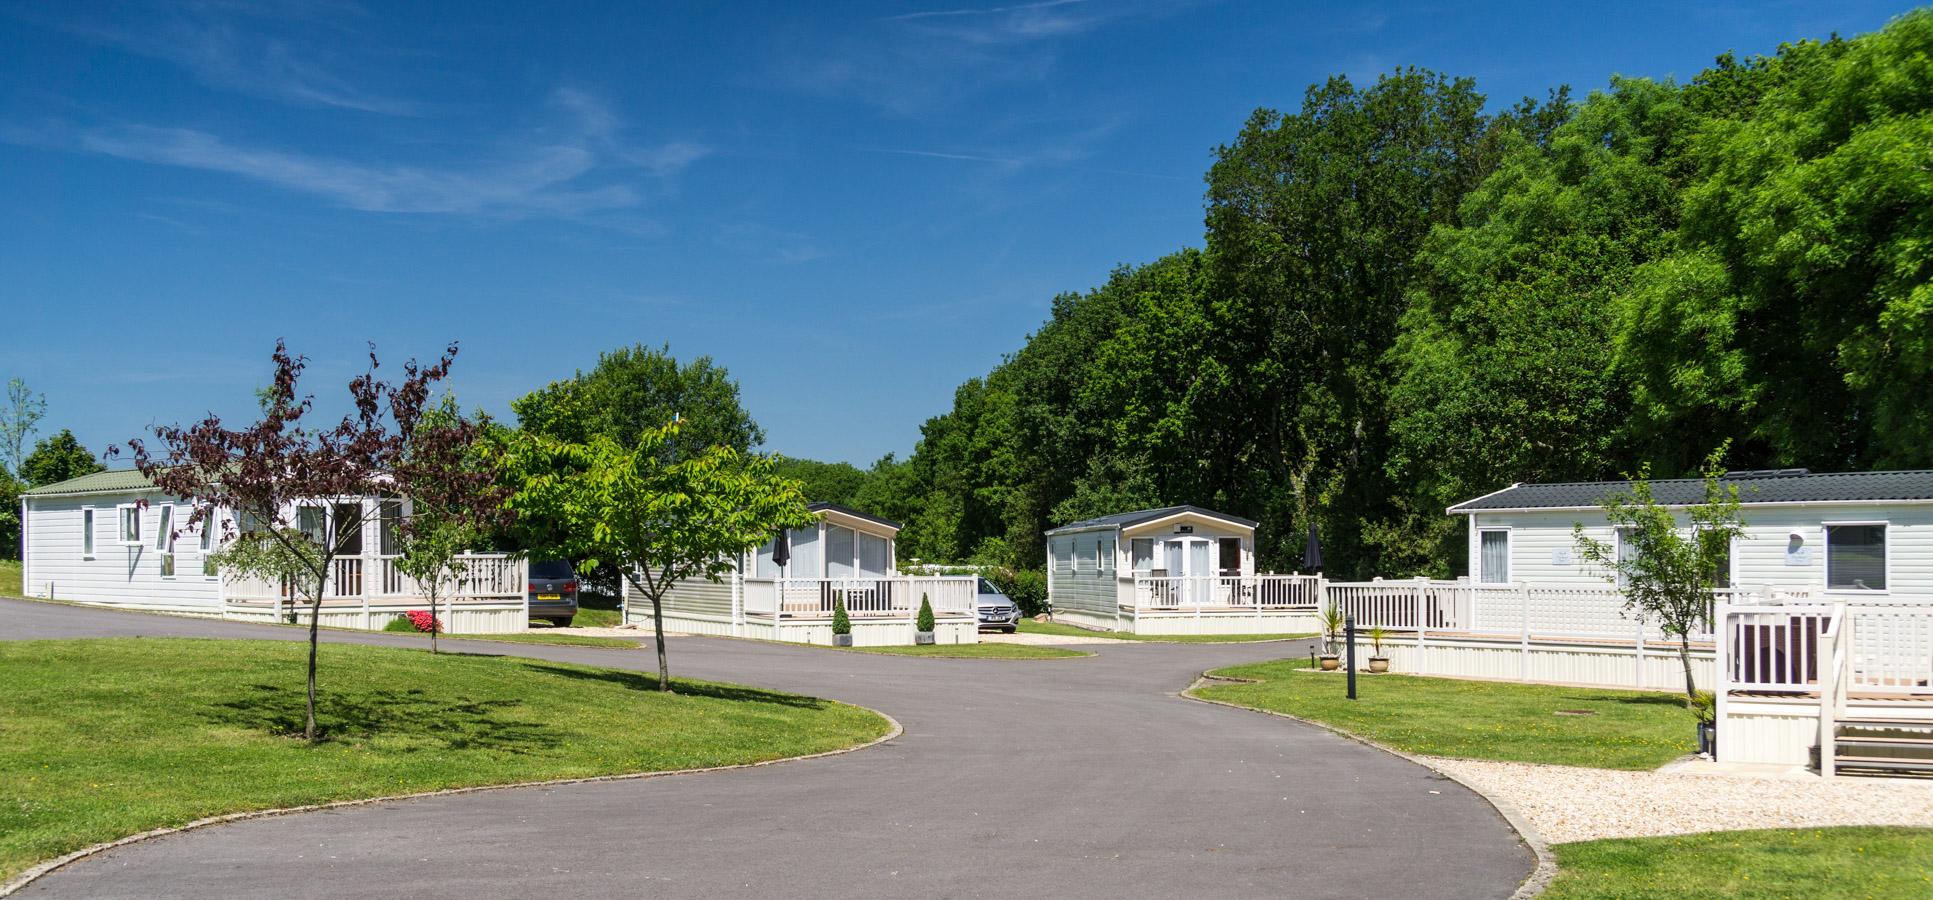 Neil-Bigwood-Monkton-Wyld-Camping-03